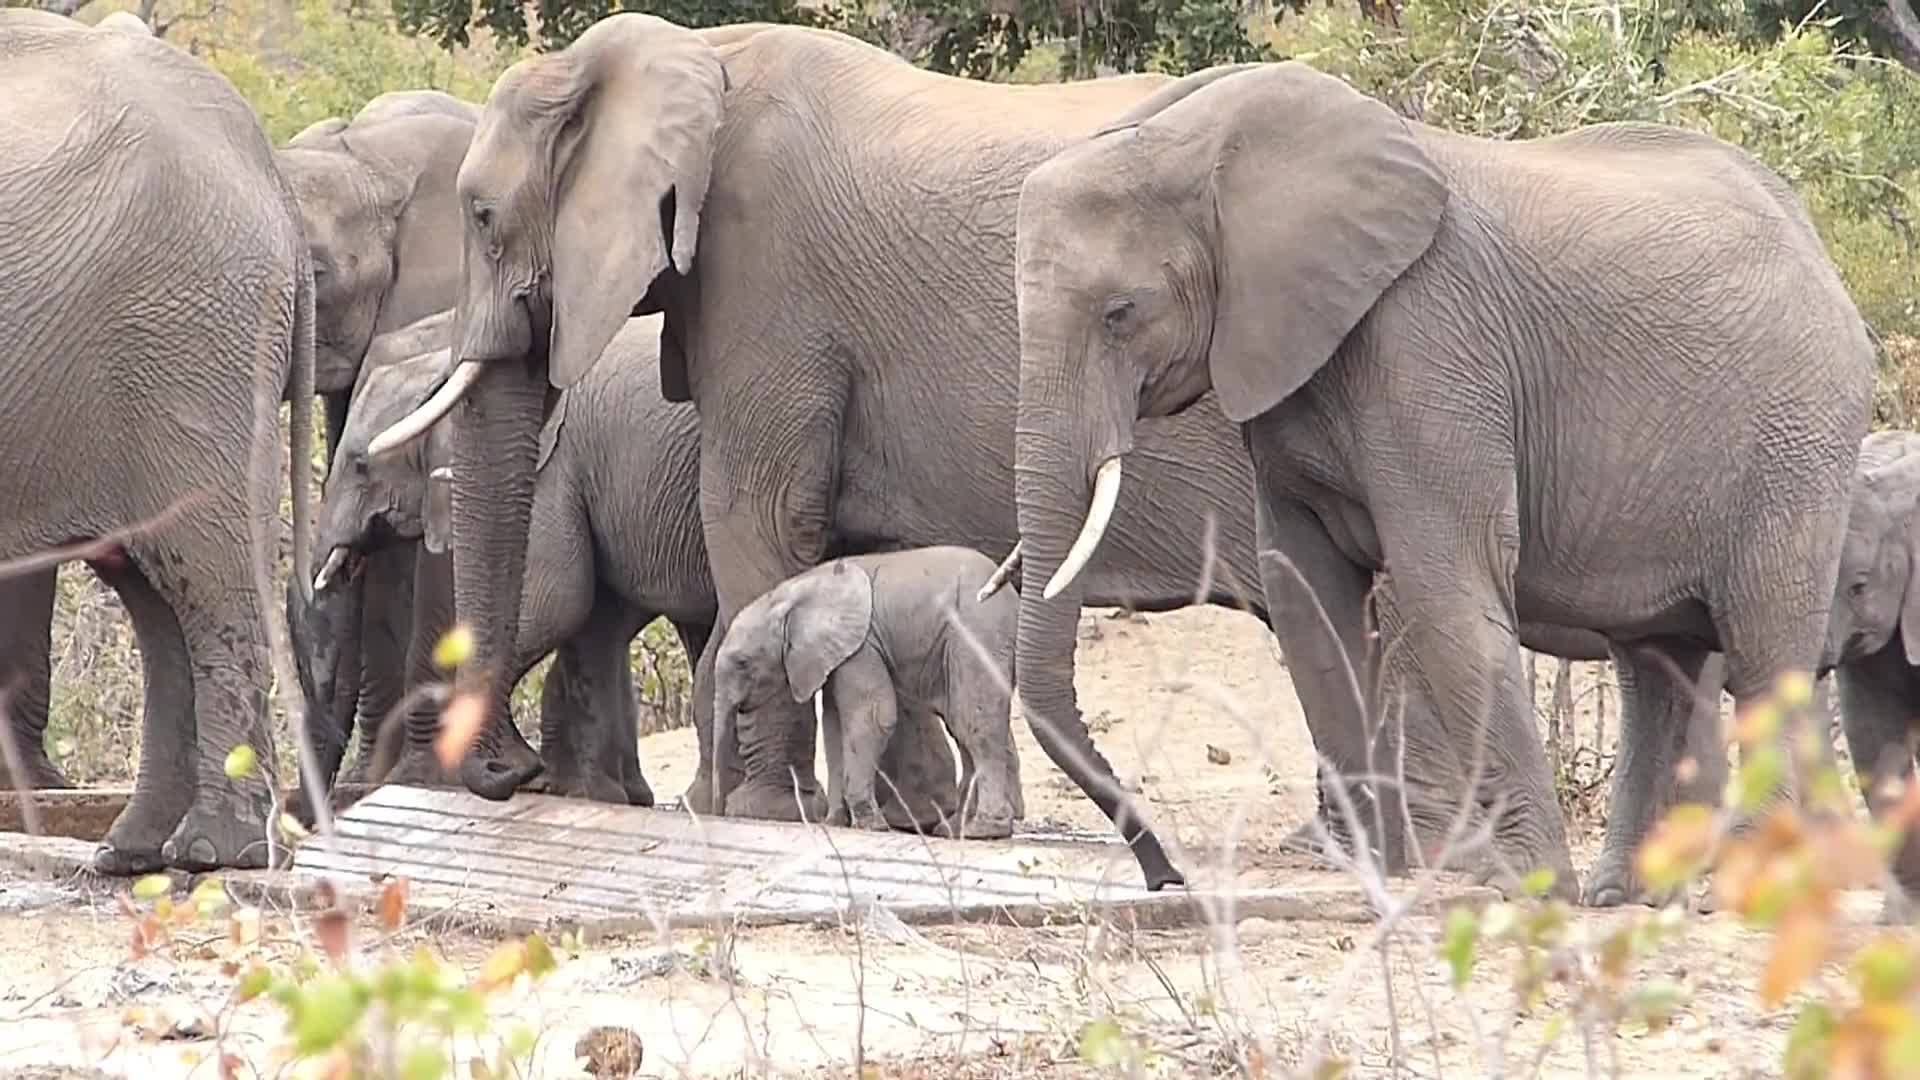 Pets & Animals, roaneric, Tiny baby Elephant GIFs